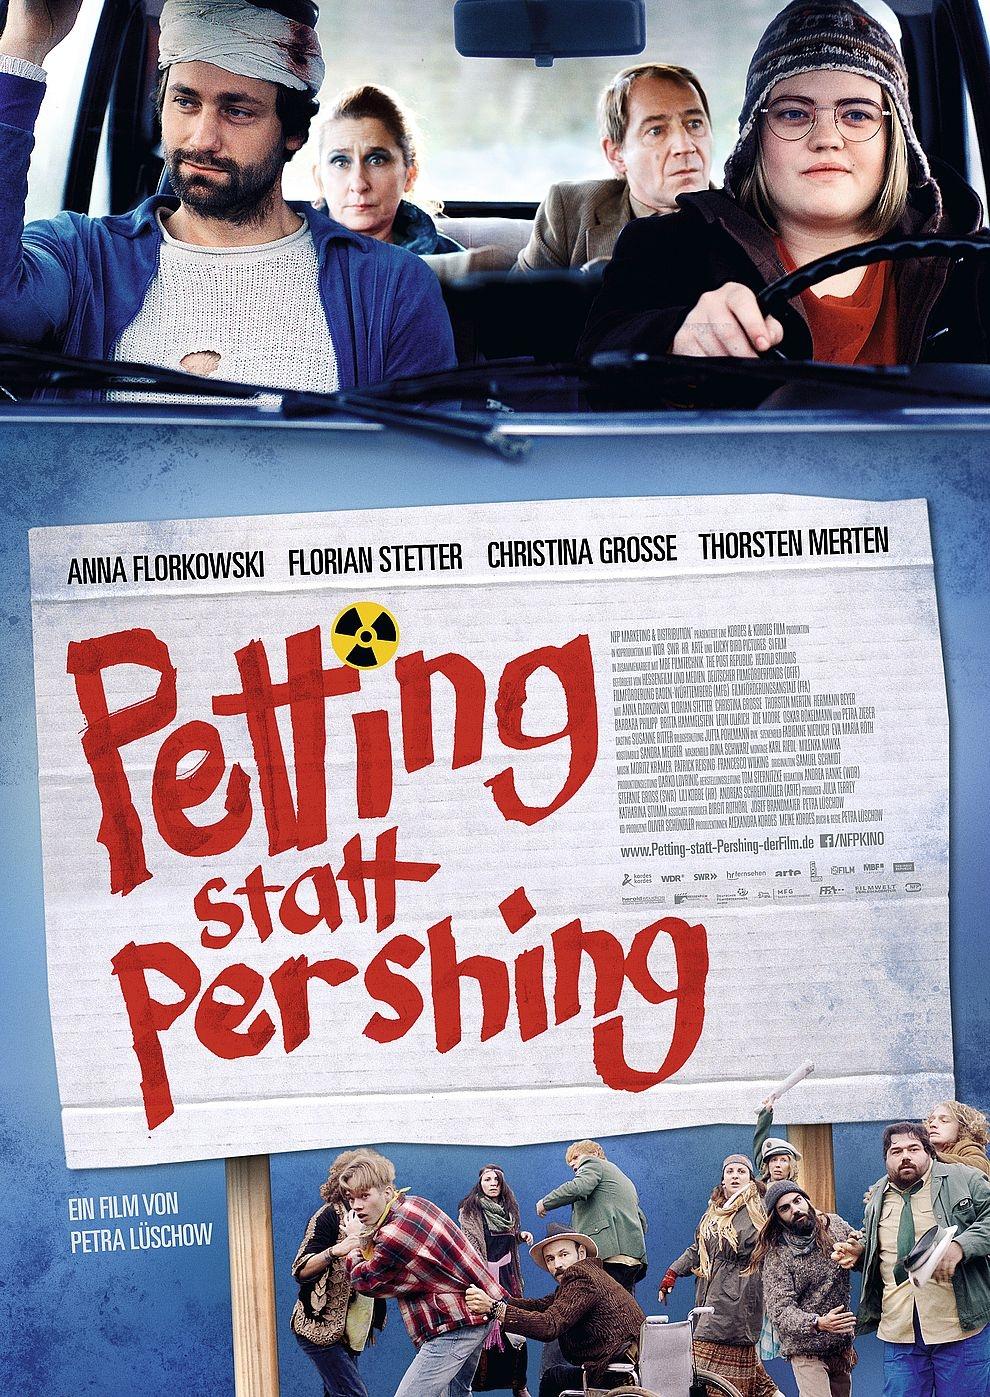 Petting statt Pershing (Poster)